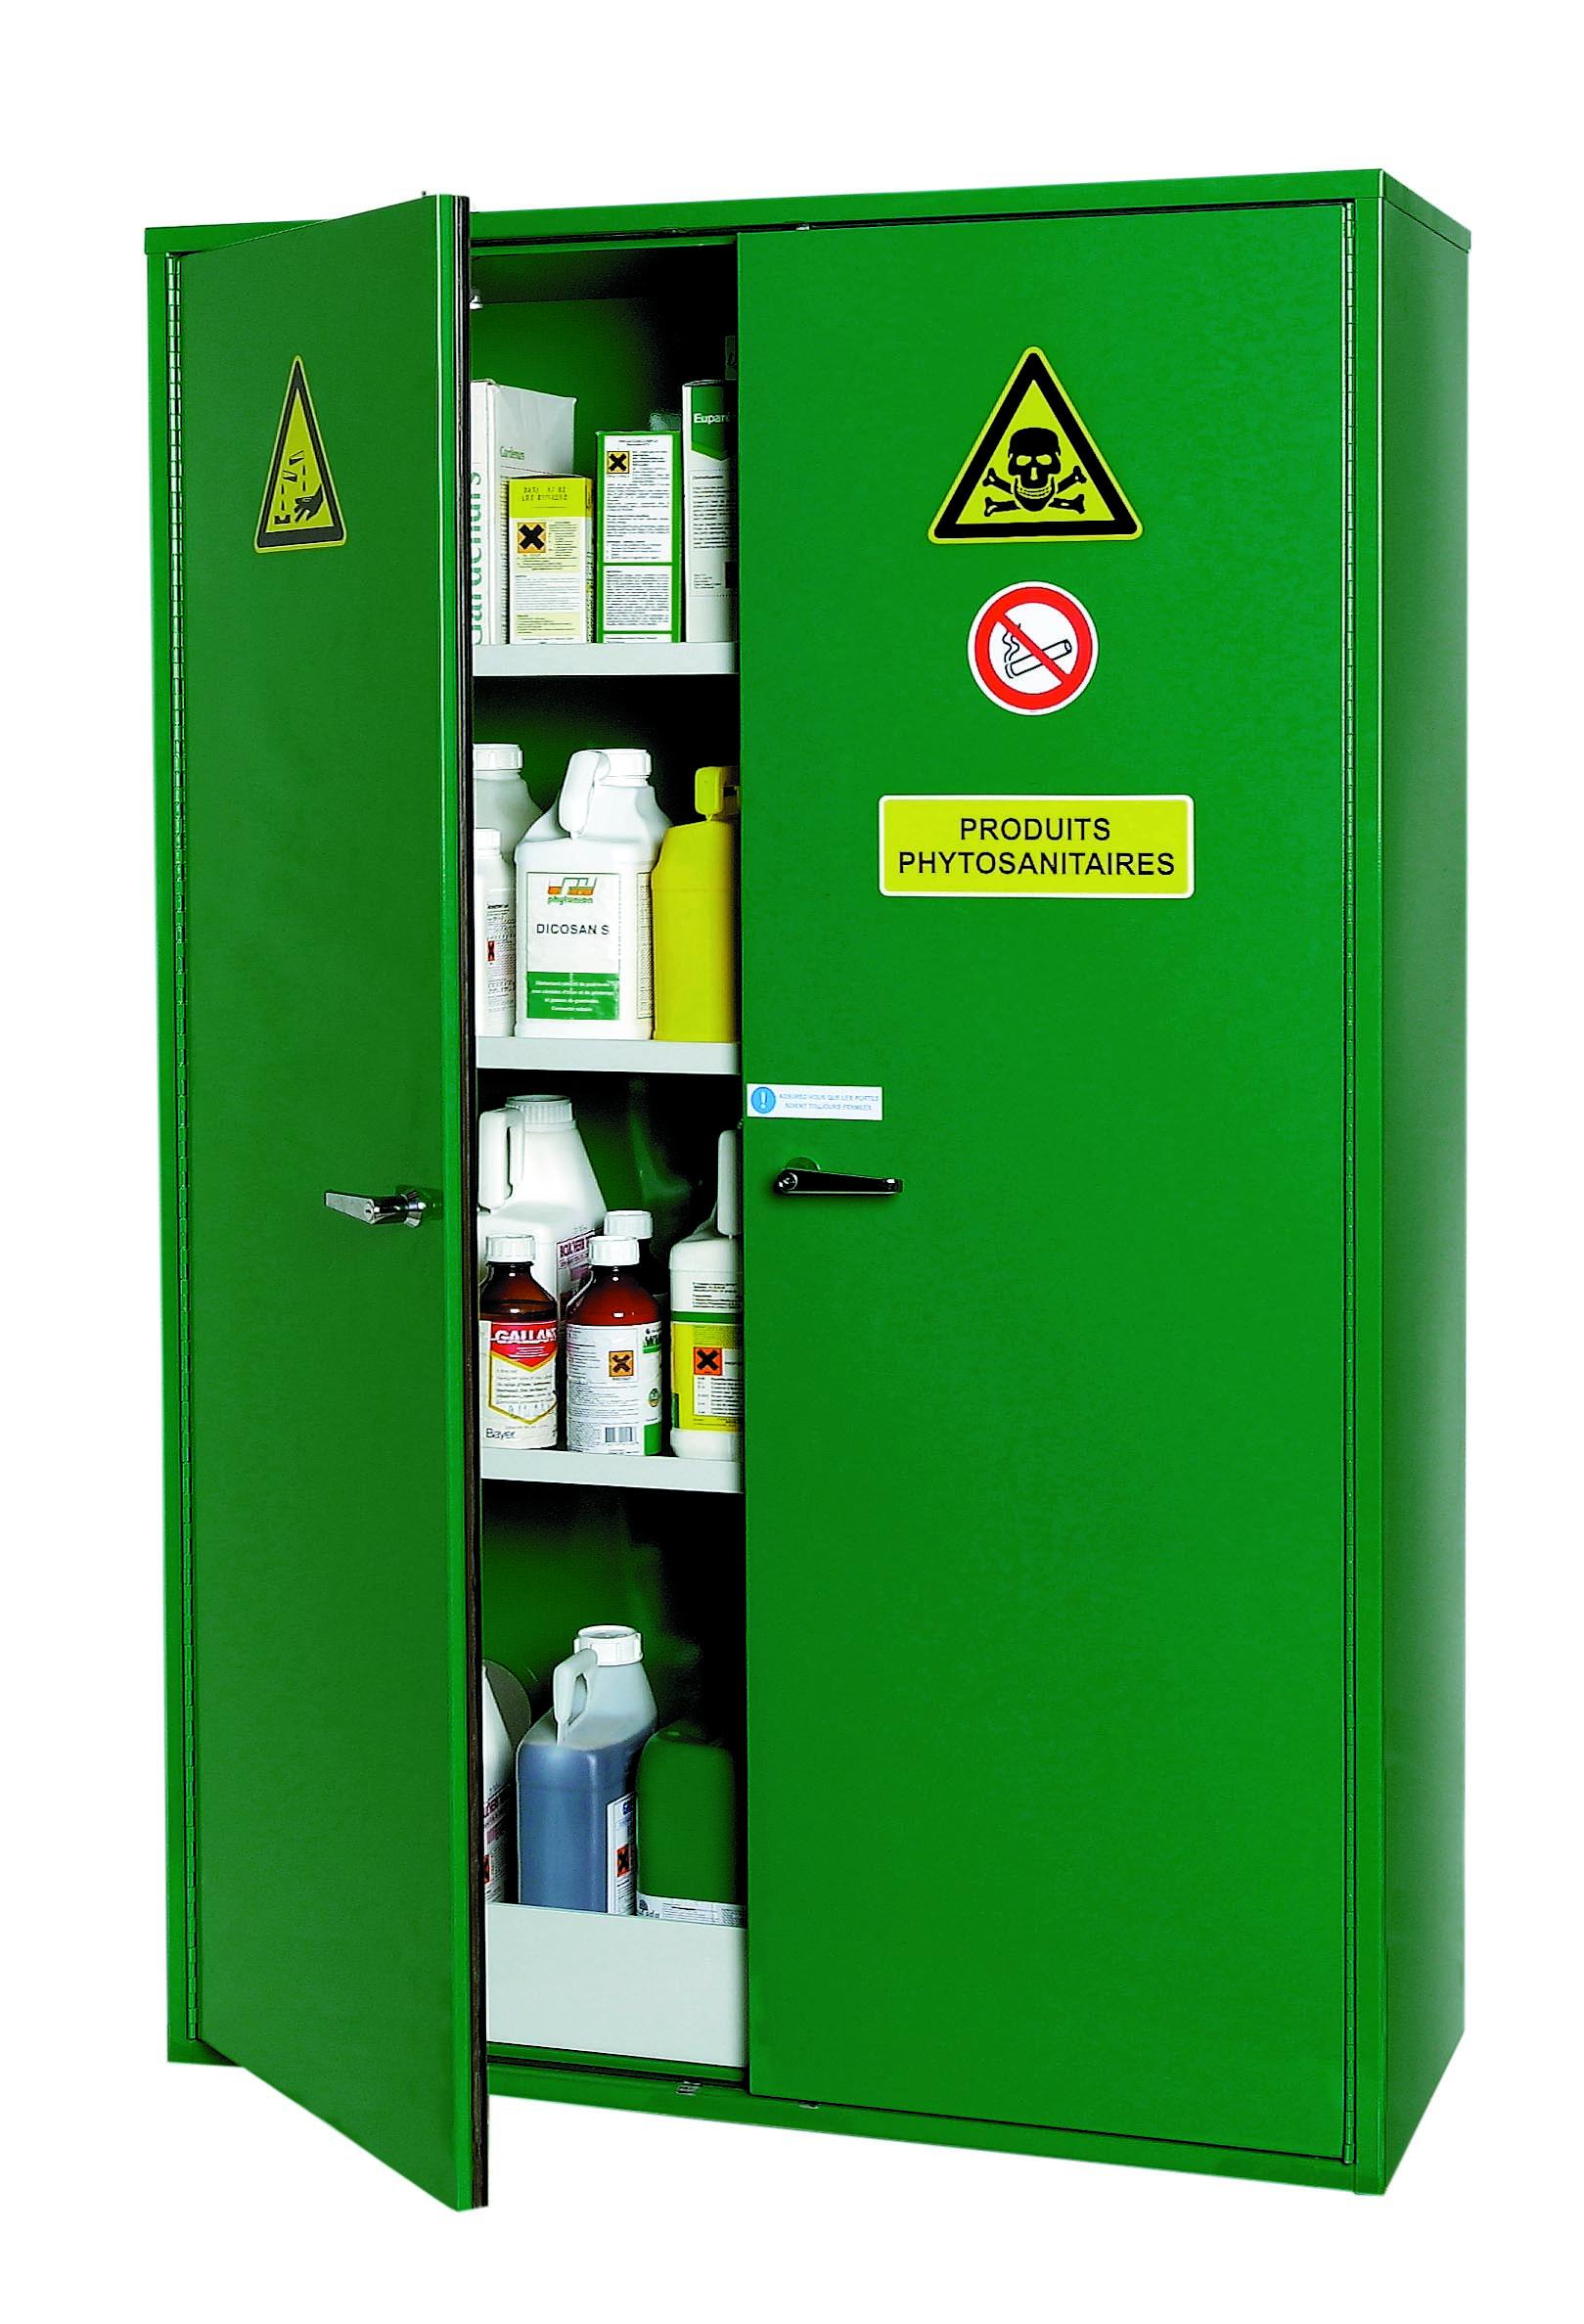 Armoire pour produits phytosanitaires, 2 portes, verte